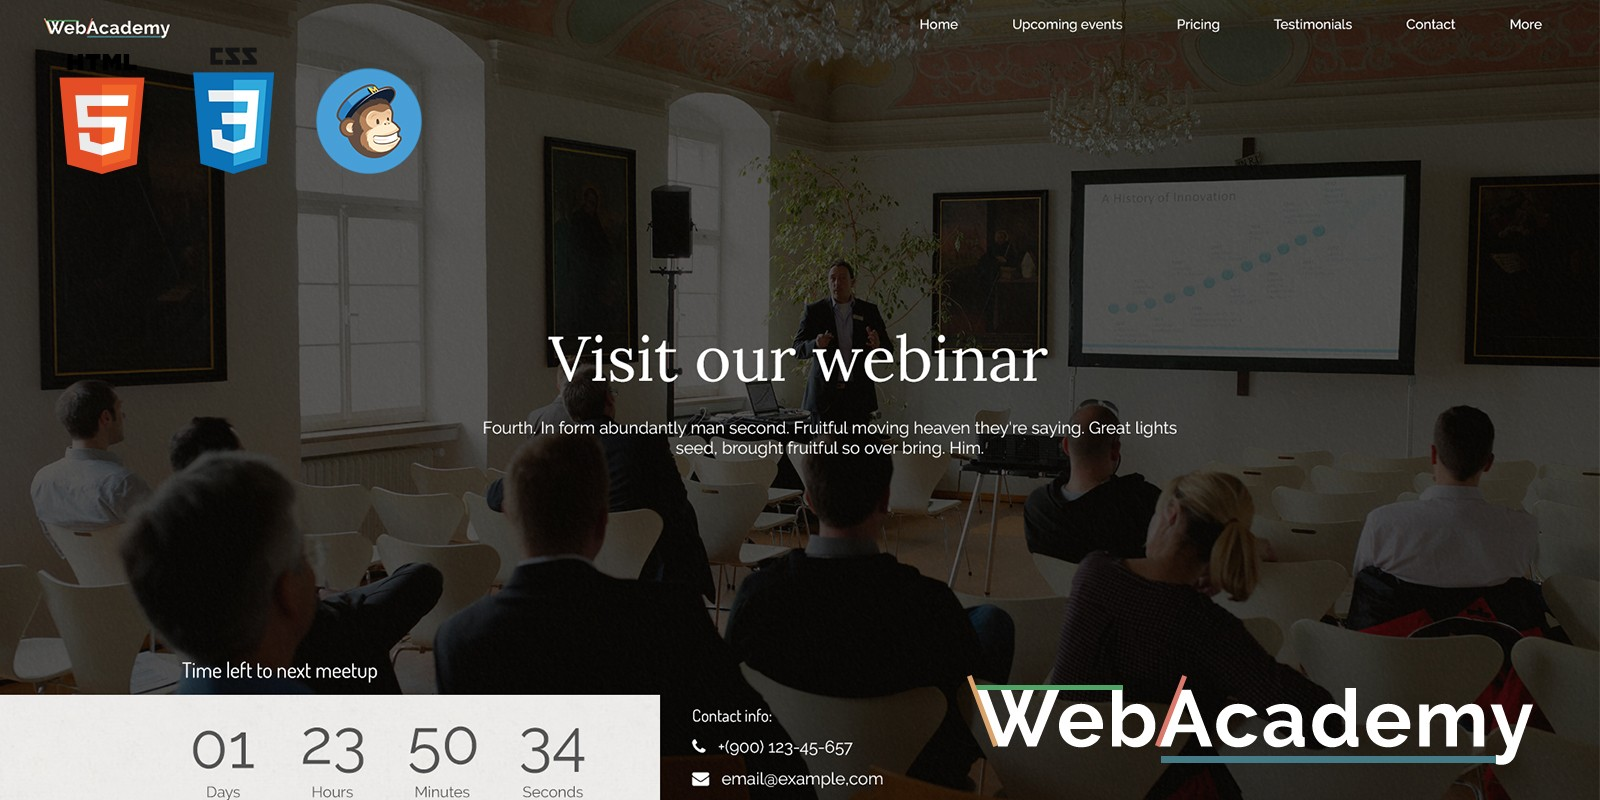 webinar html template - html education website templates | codester, Presentation templates